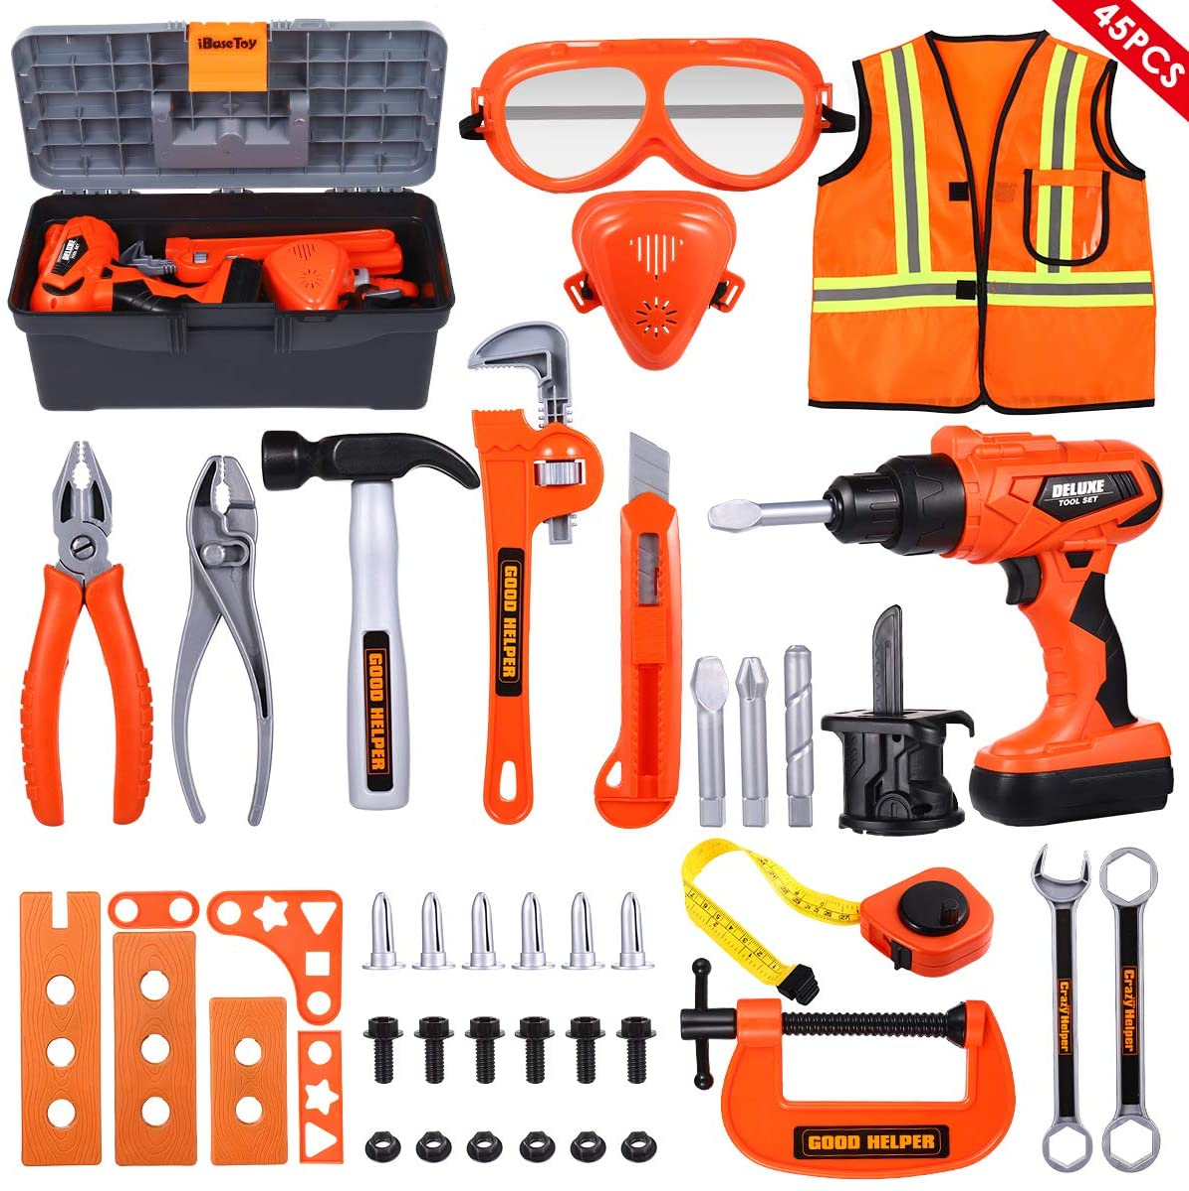 Kids Construction Tool Play Set